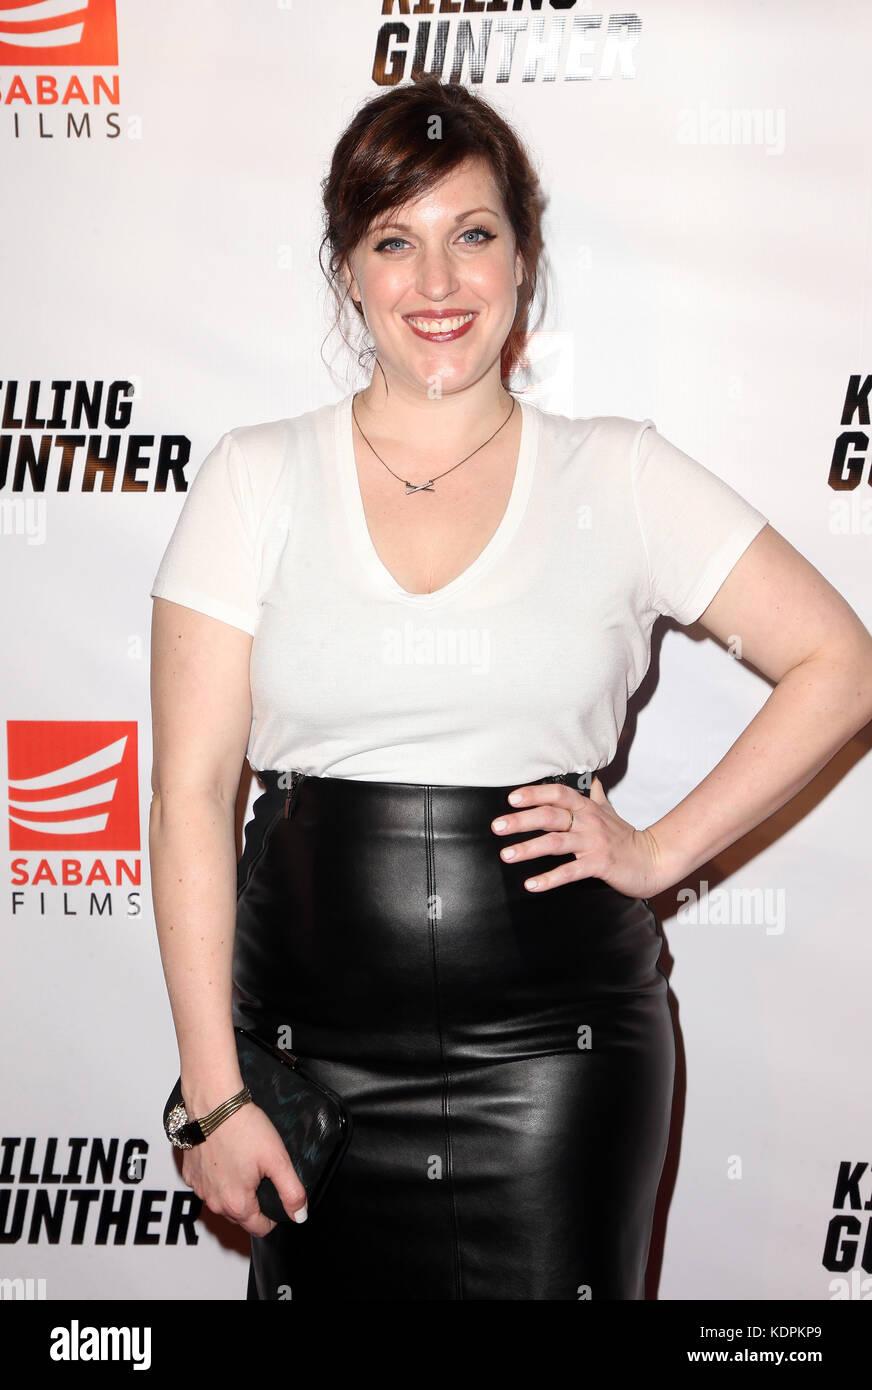 Allison tolman killing gunther film screening in los angeles naked (28 pics)